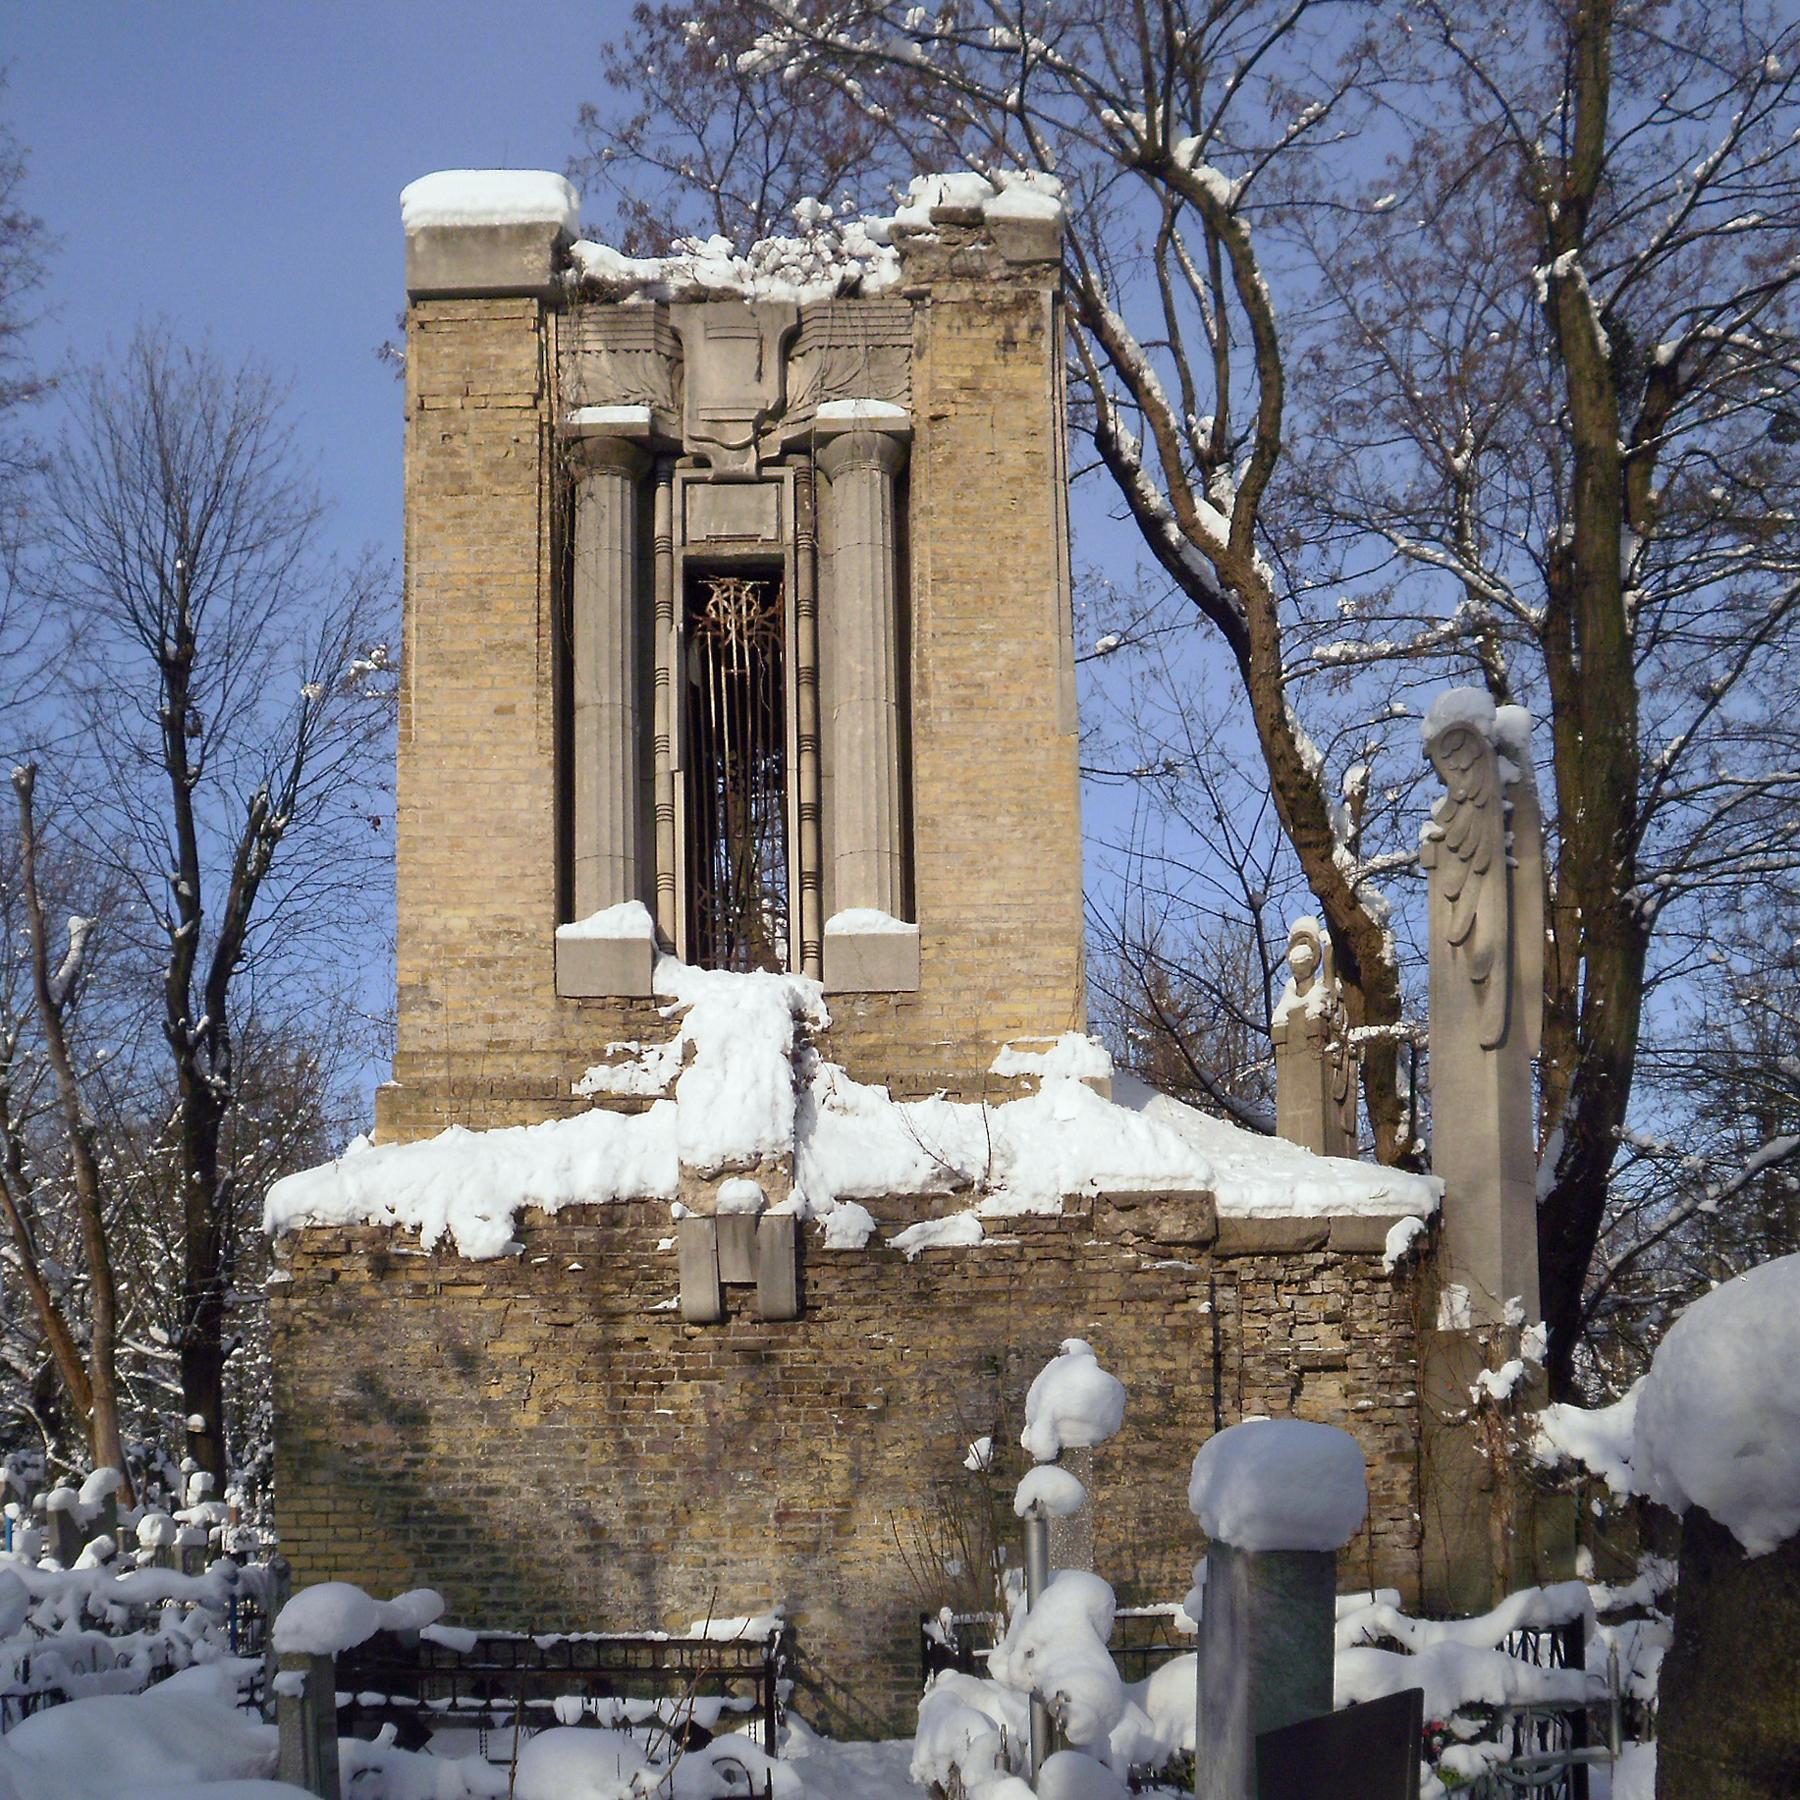 File:Склеп на Байковом кладбище.JPG - Wikimedia Commons